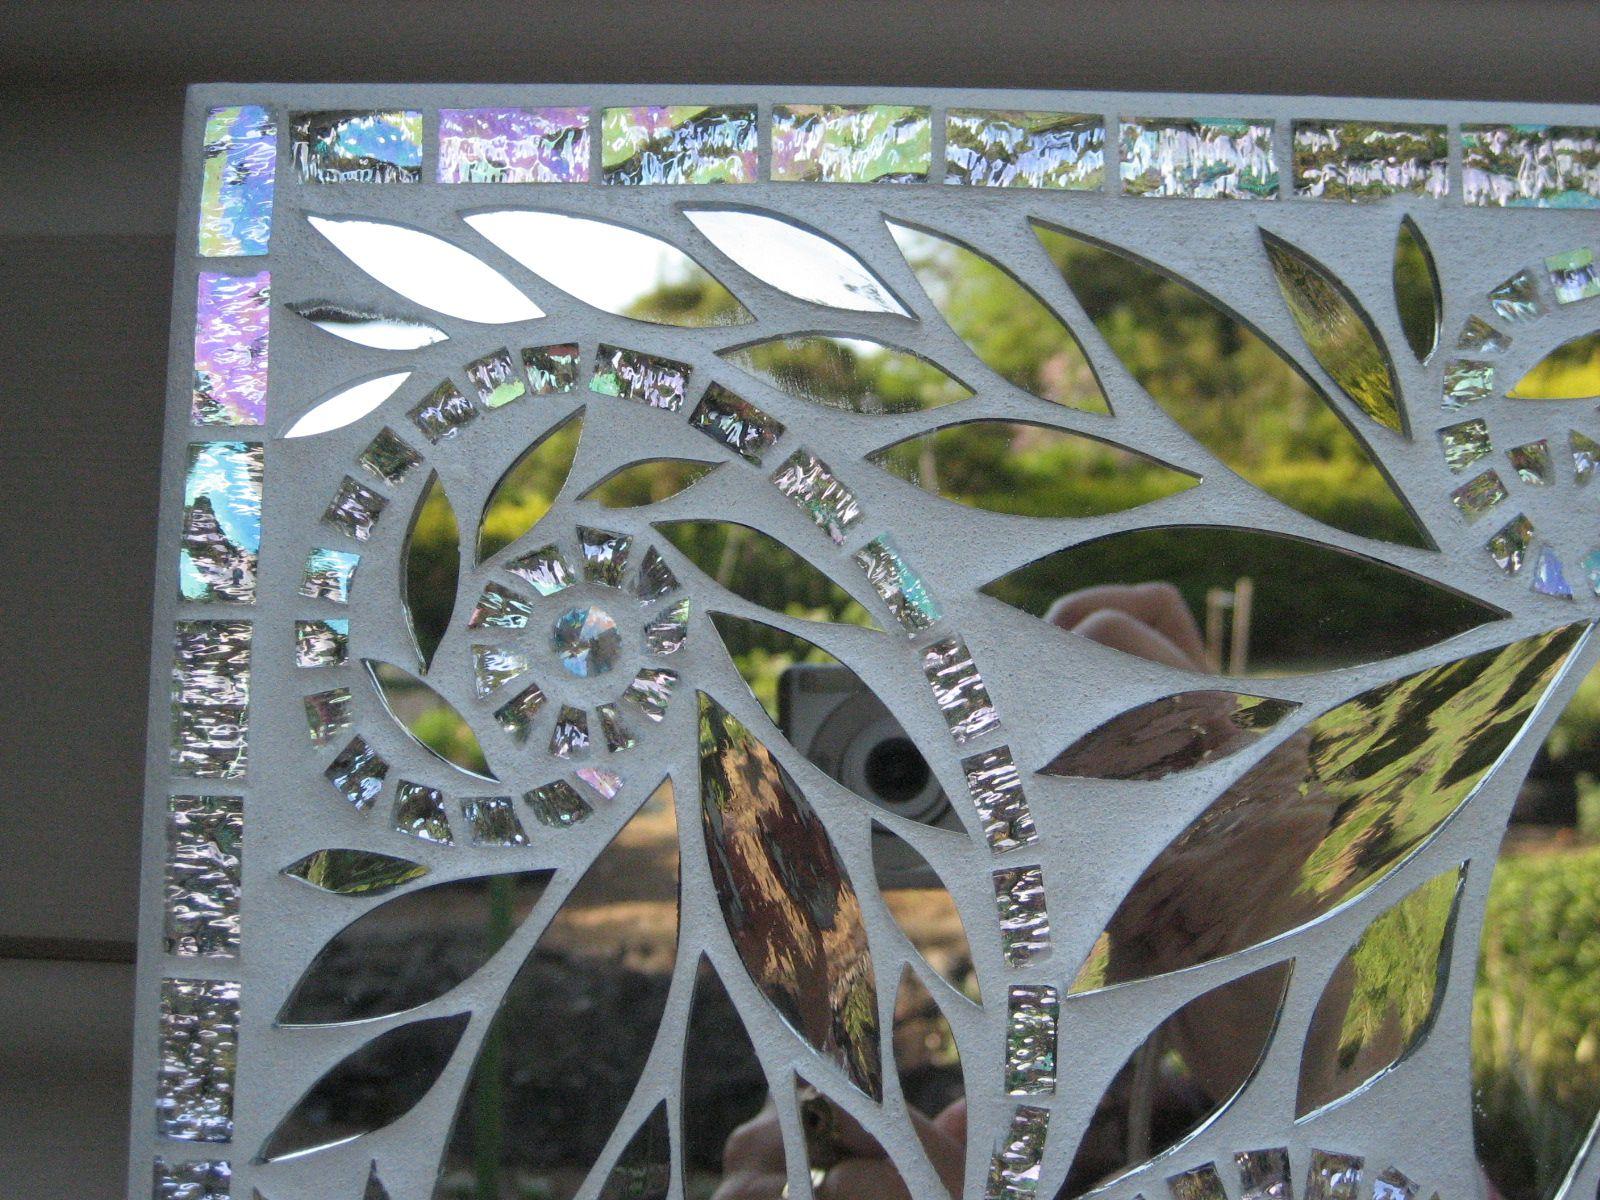 Glenmark Glass Mosaic News | Mosaic | Pinterest | Mosaicos, Espejo y ...